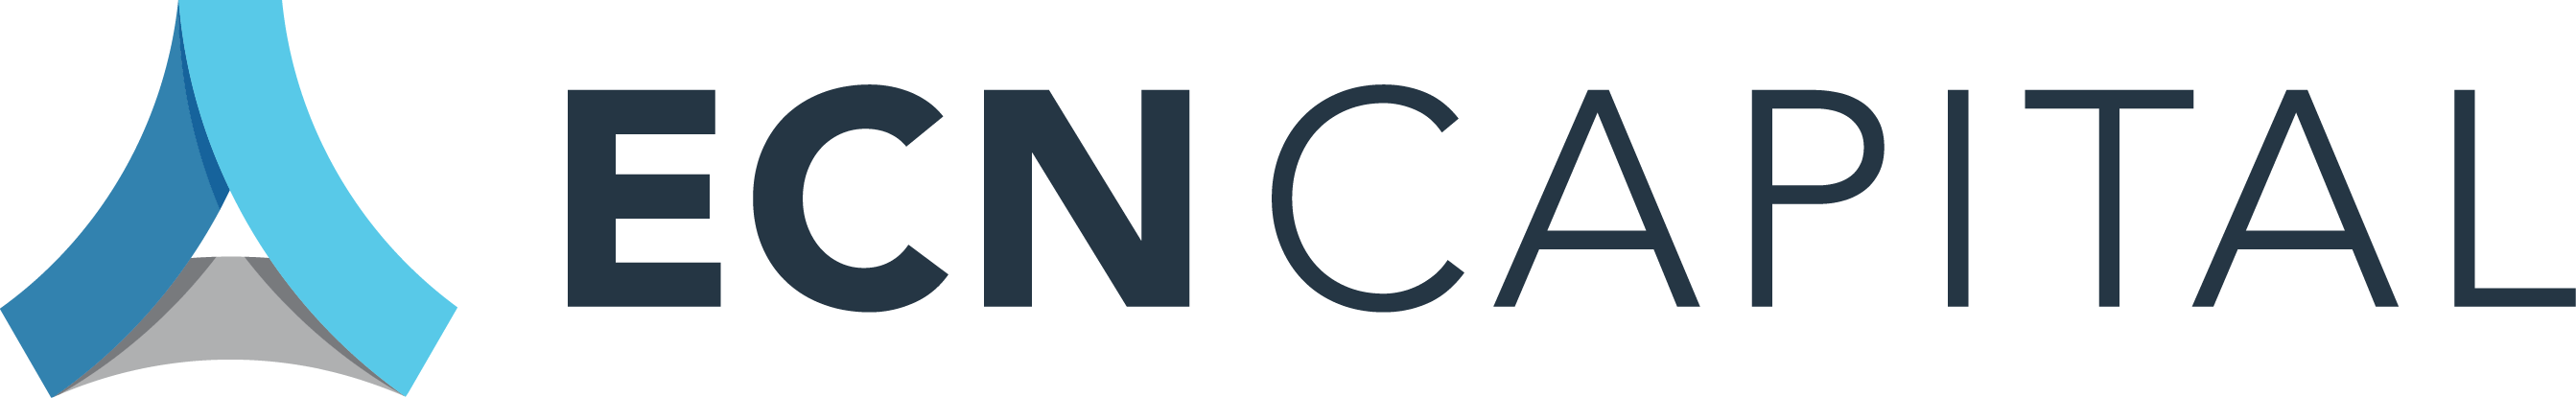 ECN Capital Schedules 2020 Investor Day